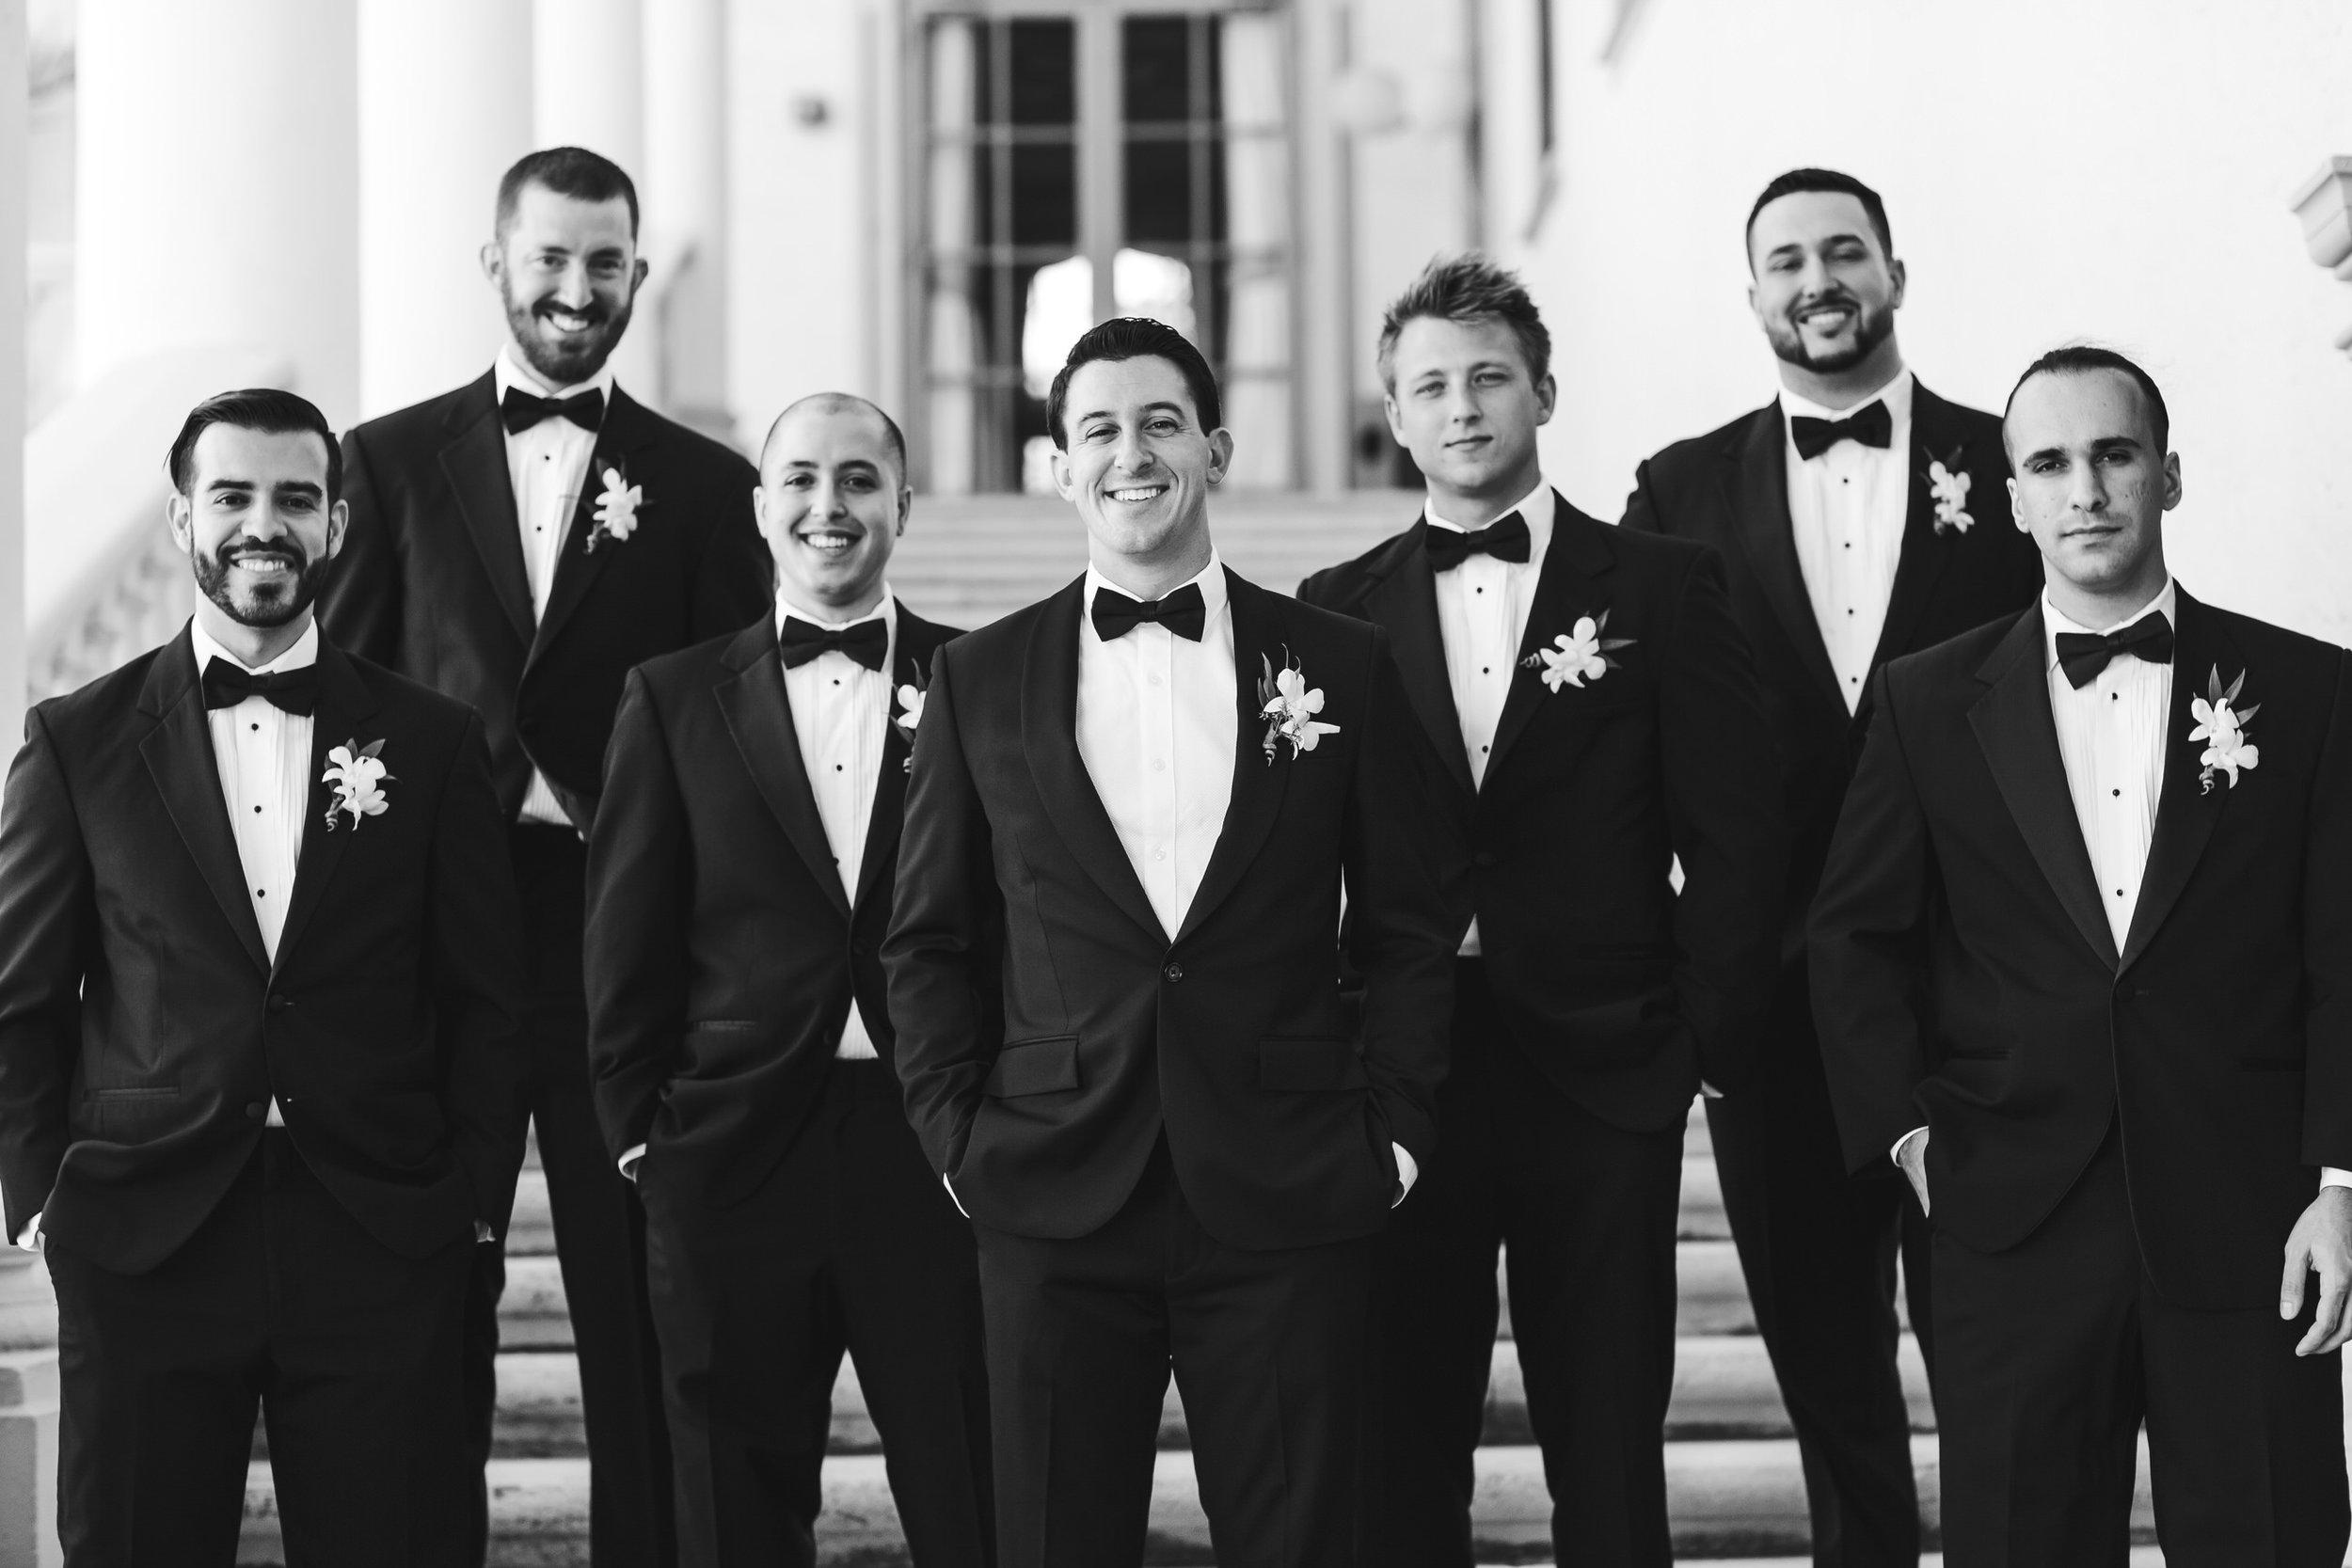 biltmore-wedding-groom-getting-ready-steph-lynn-photo-miami-27.jpg